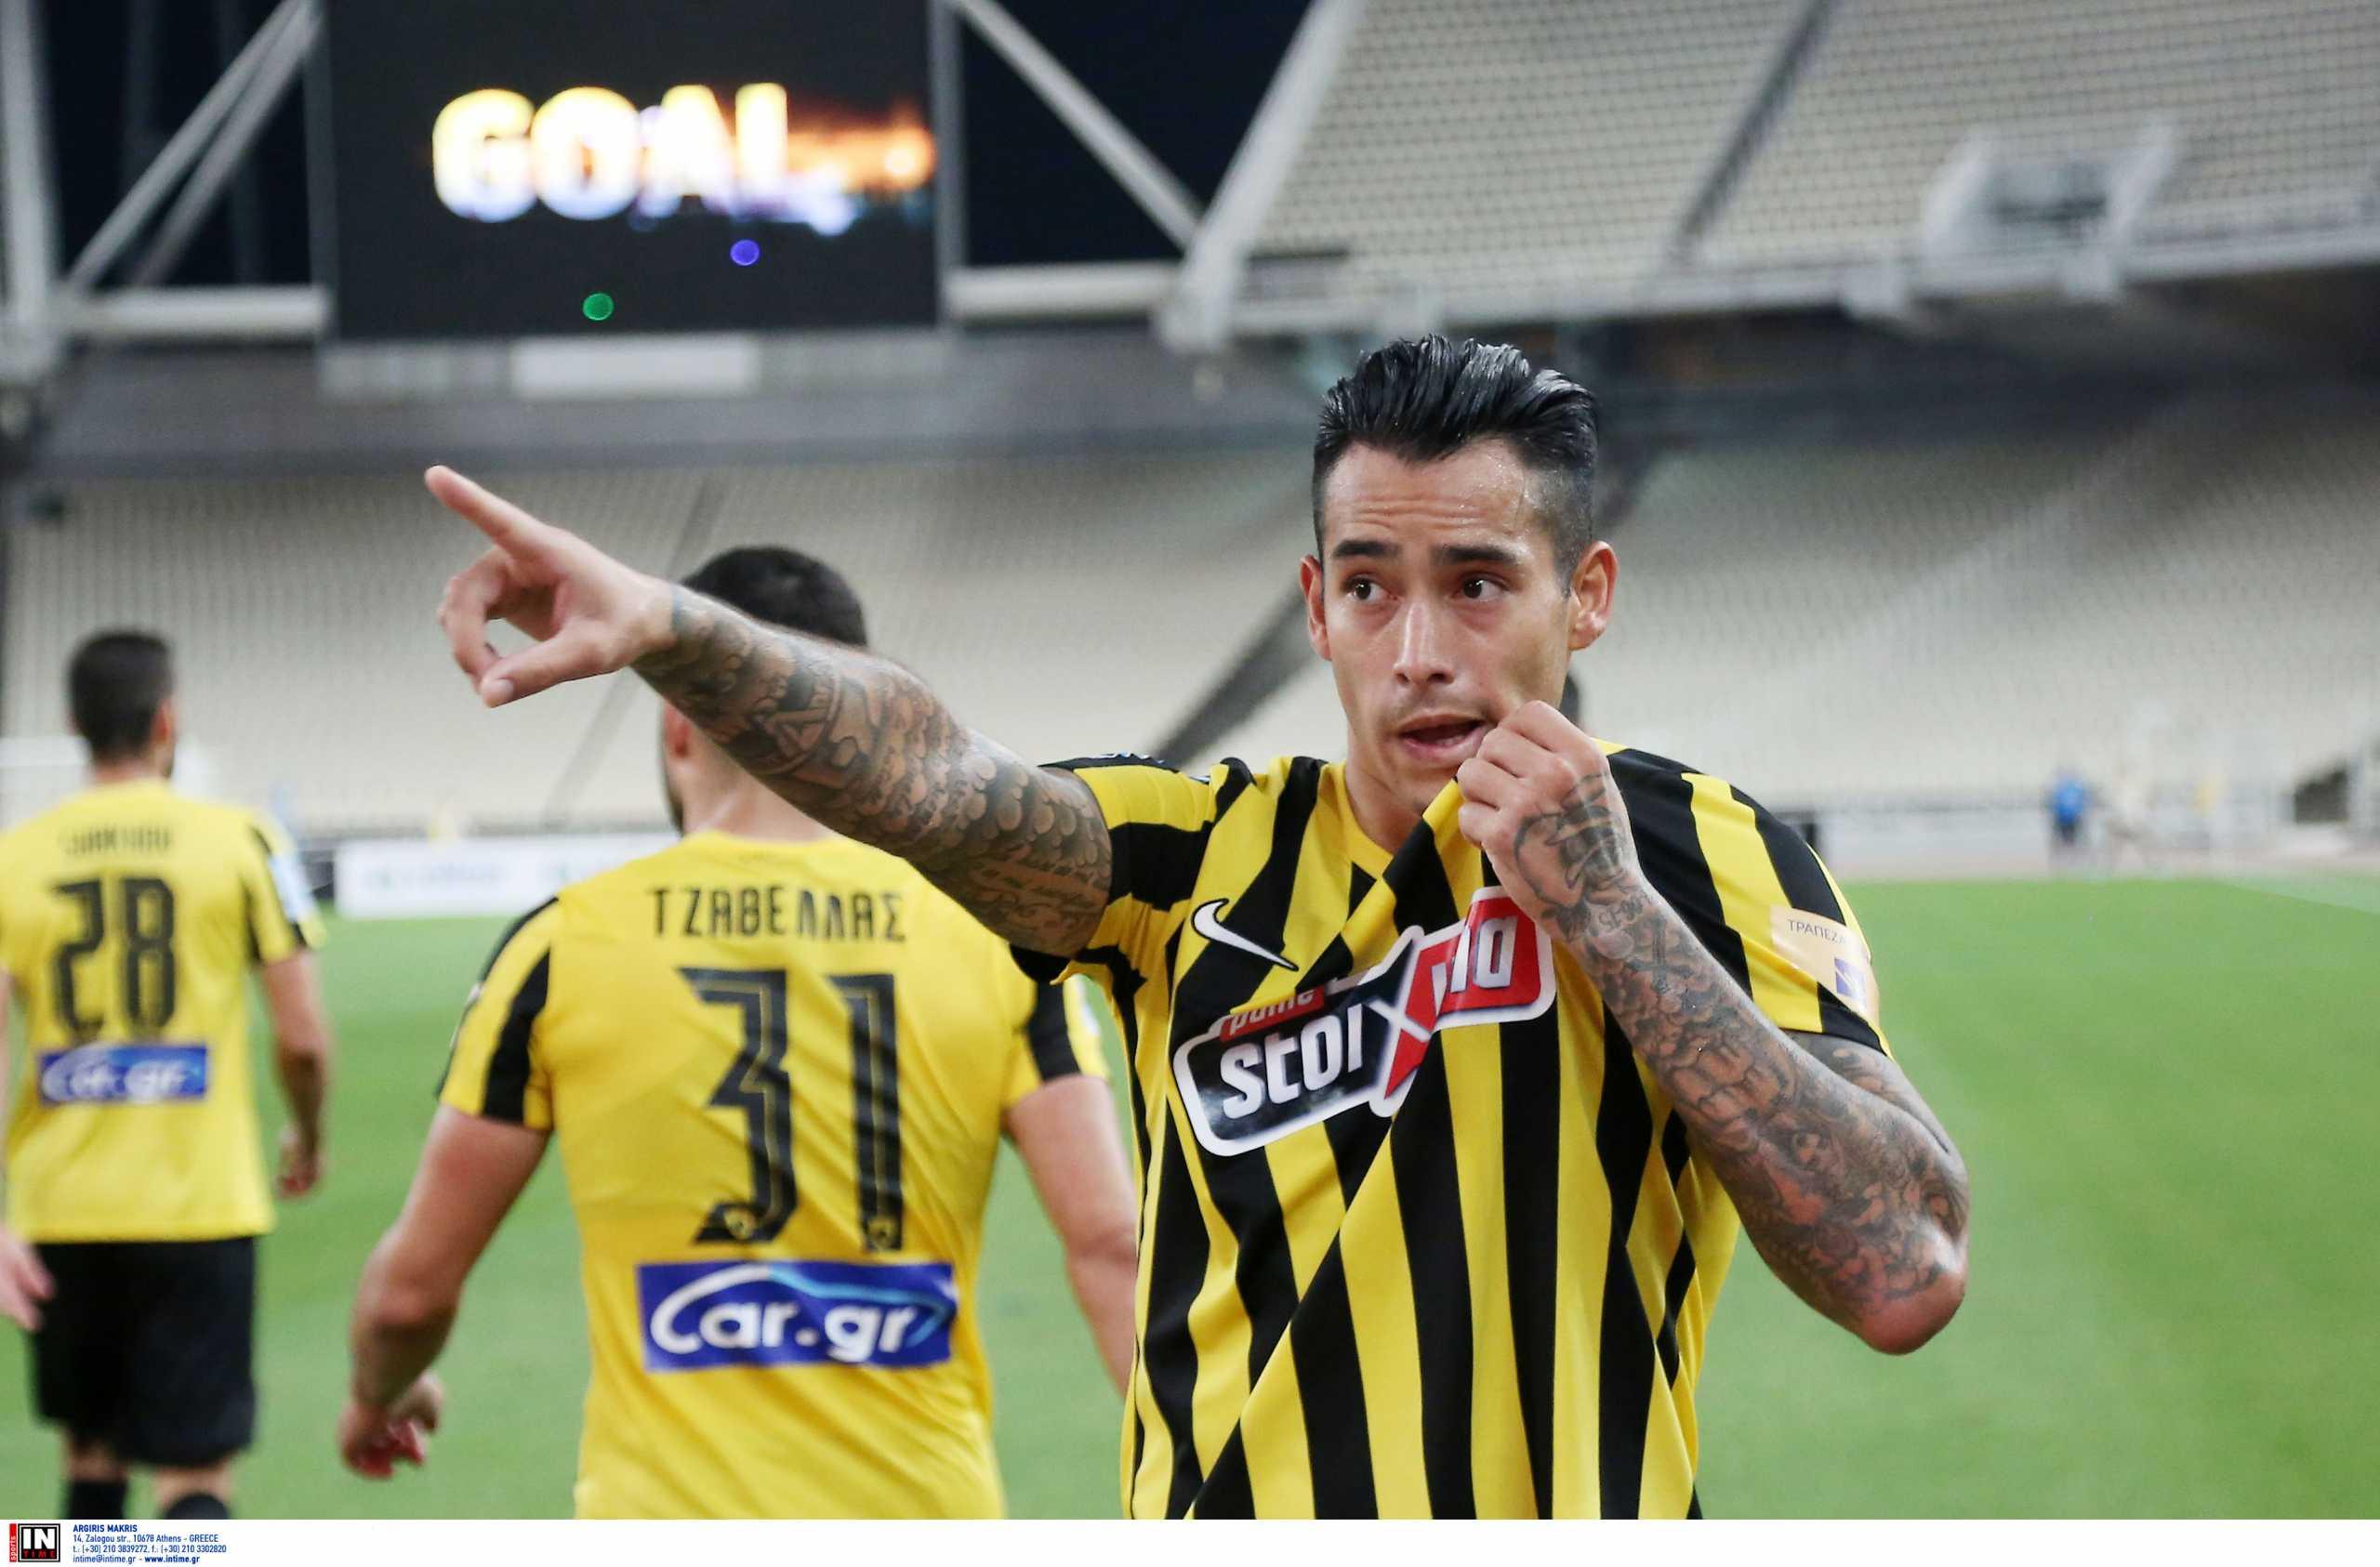 Superleague 1, ΑΕΚ – Λαμία 1-0: Ο Σέρχιο Αραούχο έλυσε το «Γόρδιο δεσμό» που βρήκε στο ΟΑΚΑ